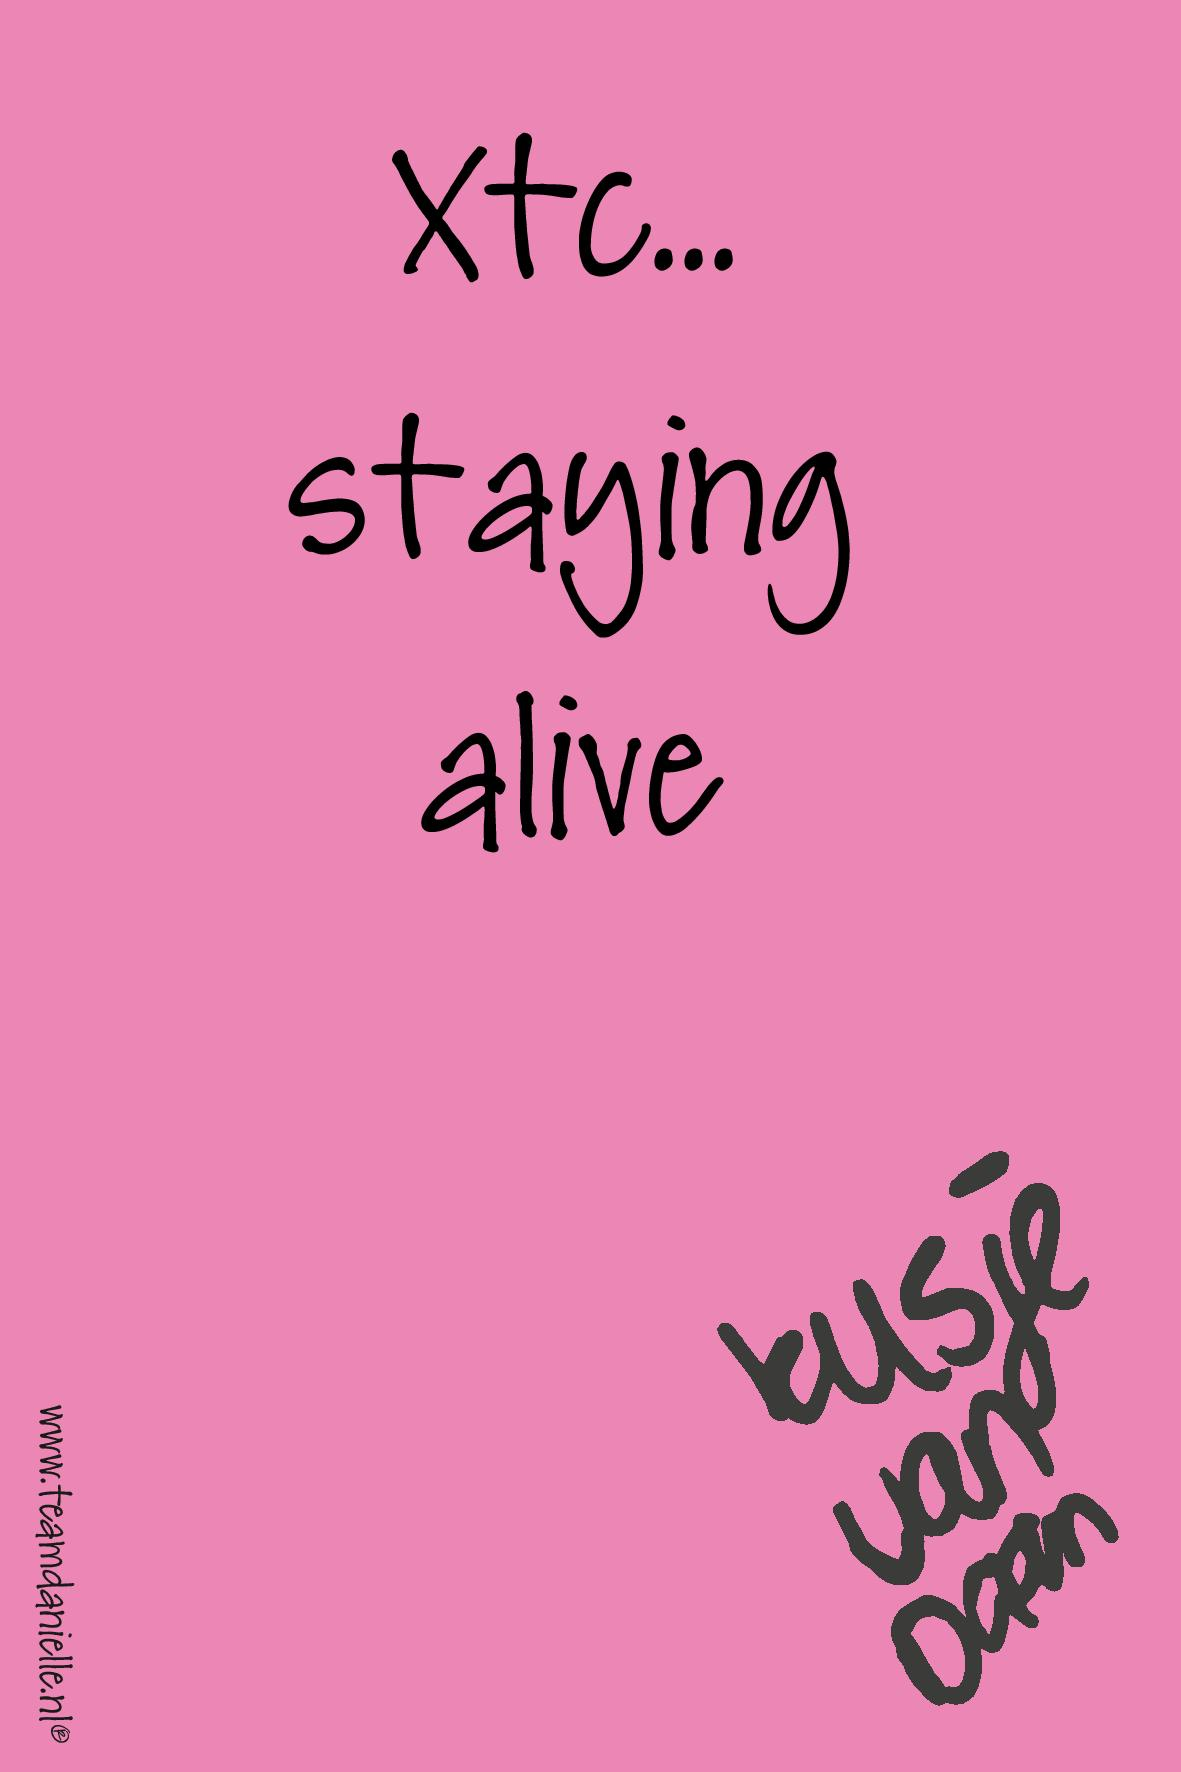 Kusje-180811-m-staying alive